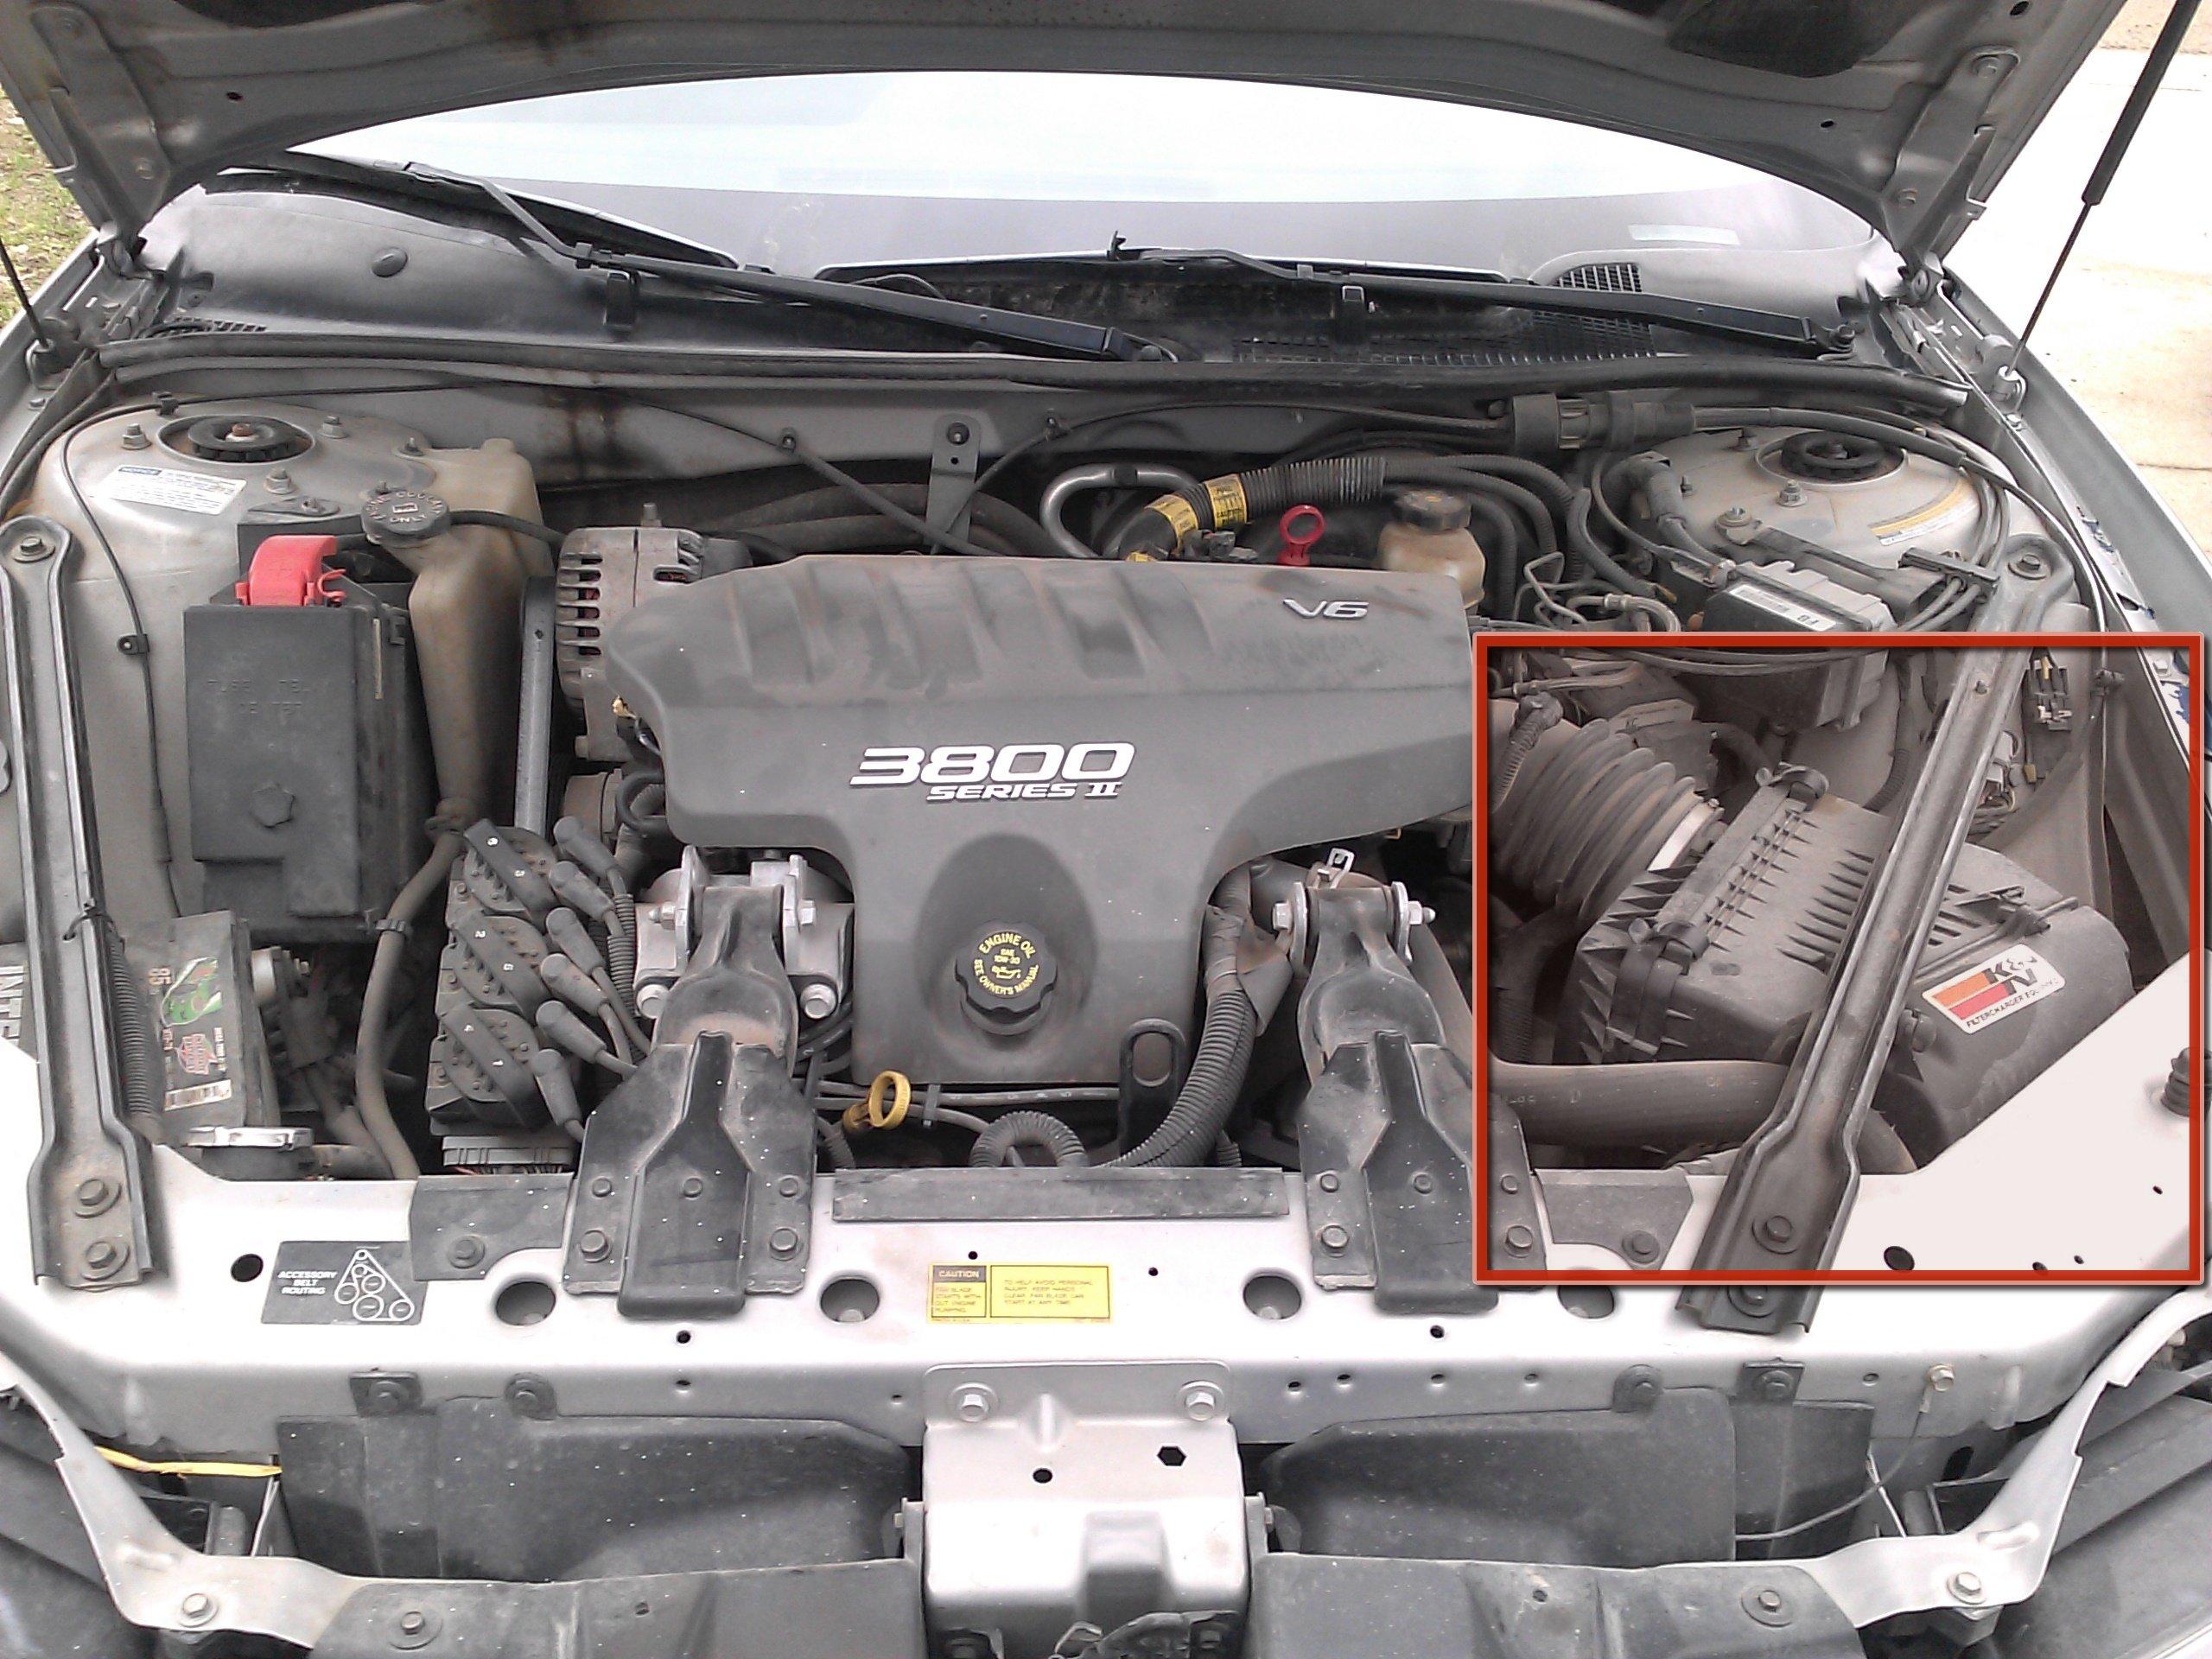 1999 Pontiac Grand Prix Engine Diagram Wiring Diagram Belt Tele Belt Tele Emilia Fise It